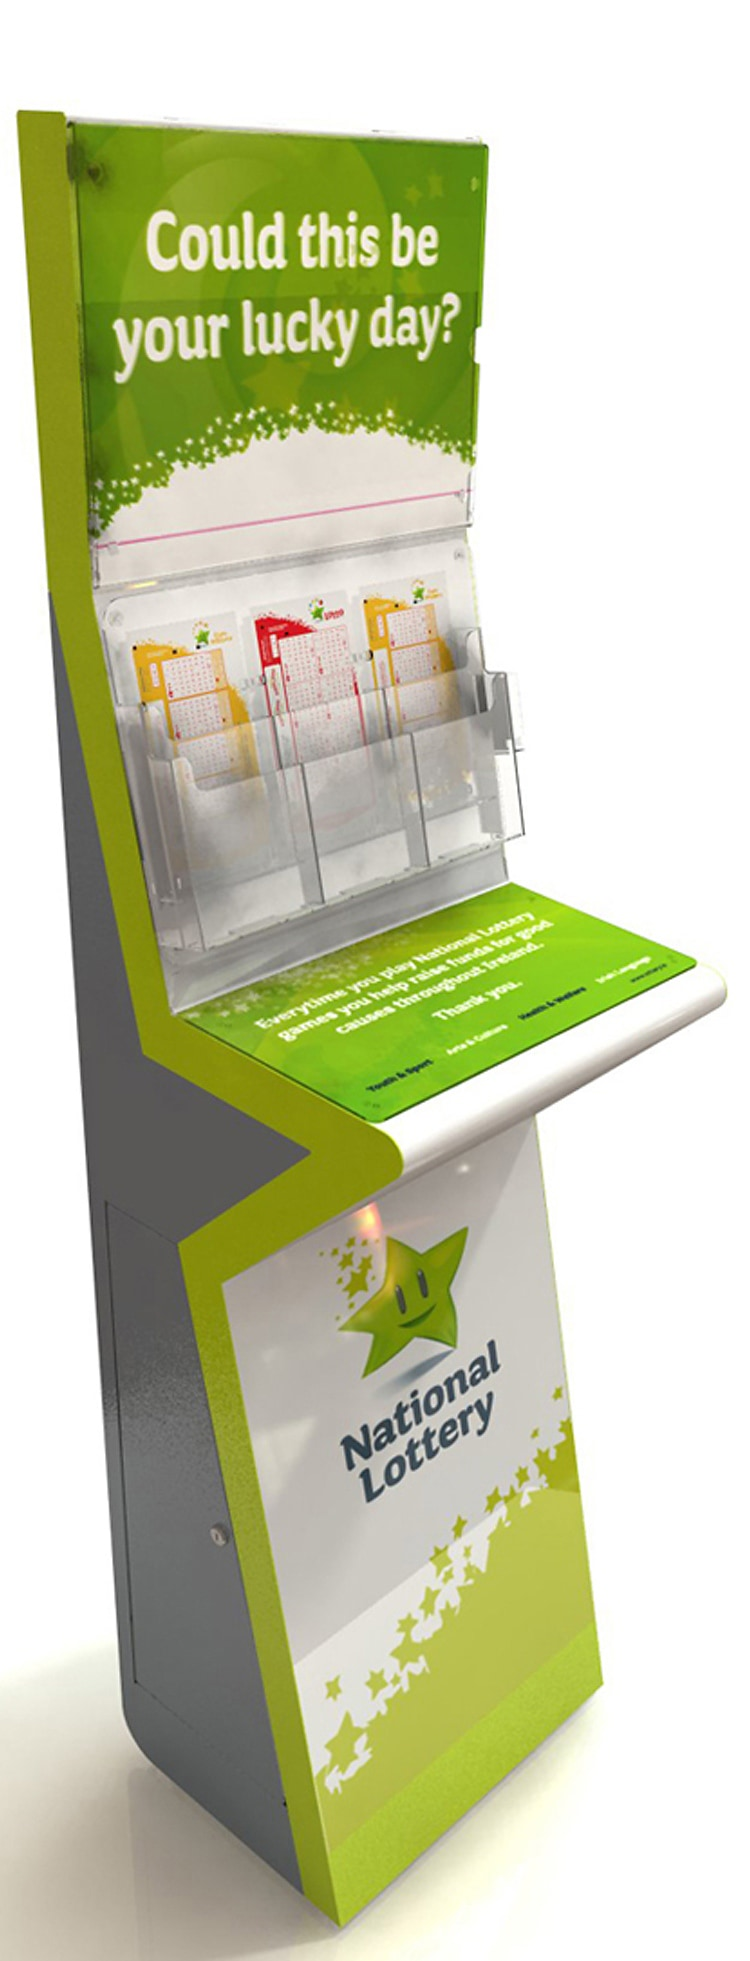 Lotto - Playstand 1.jpg